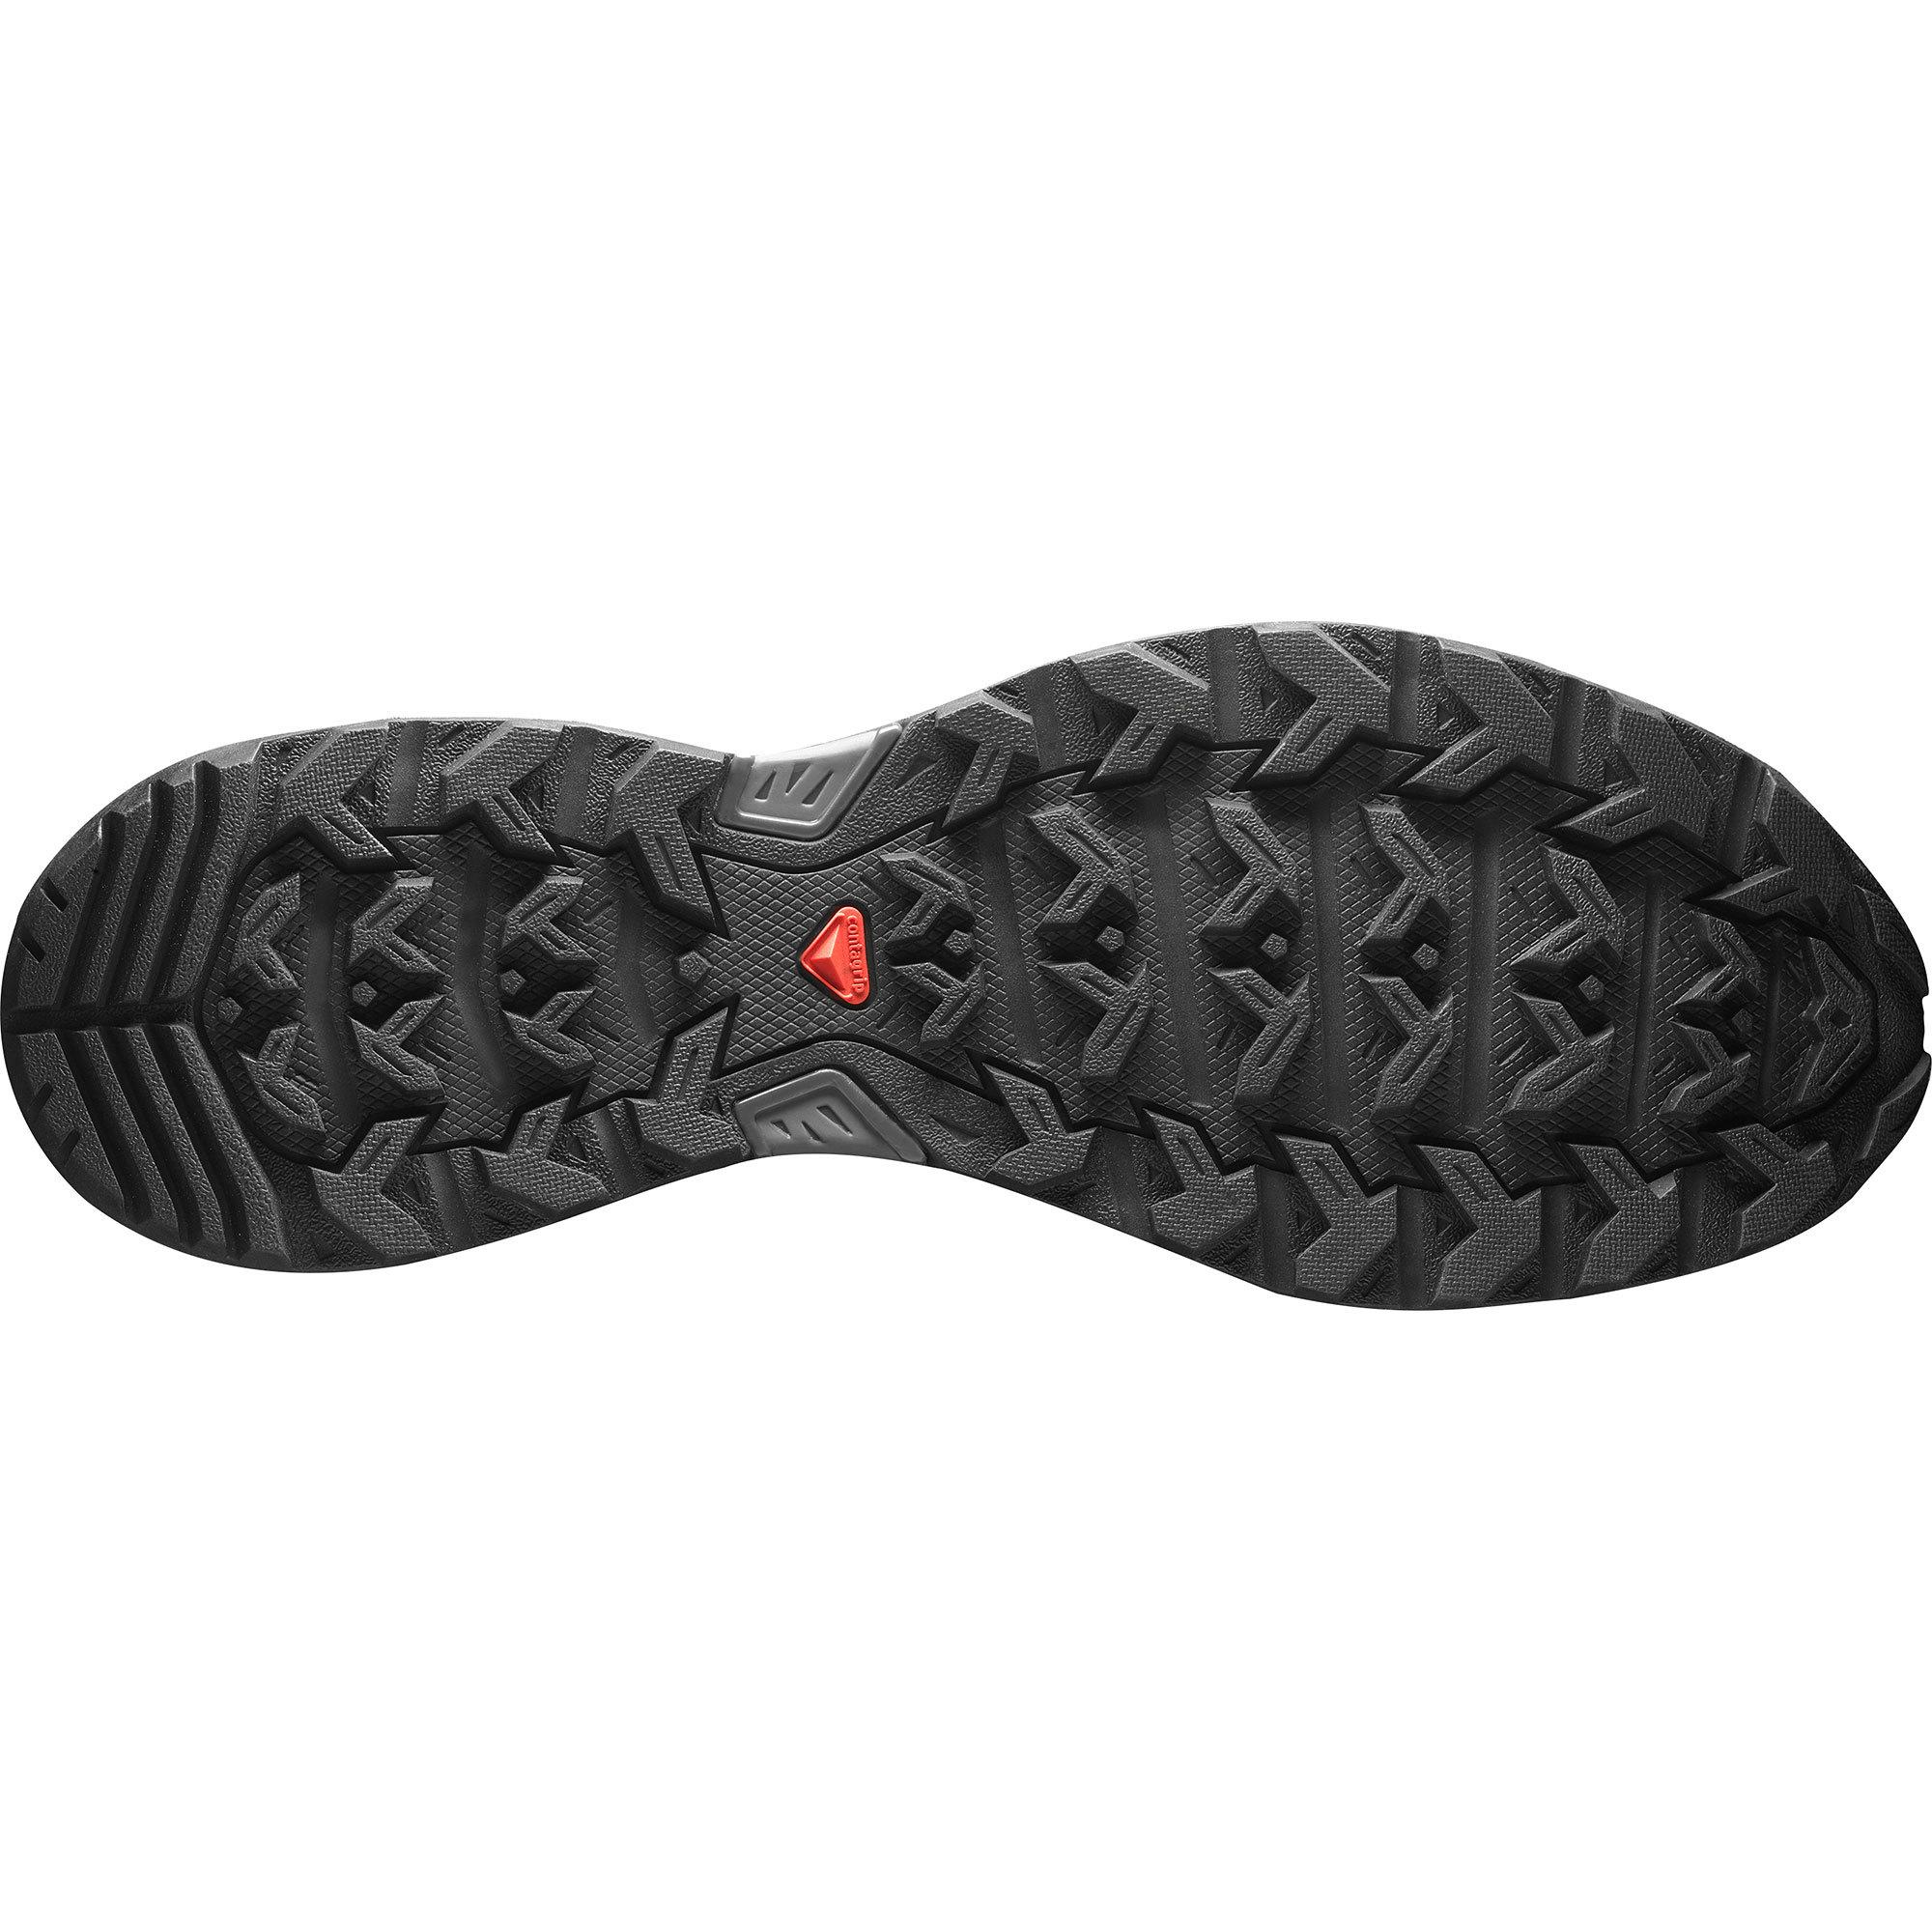 Salomon X Ultra 3 GTX Men's Hiking Shoes